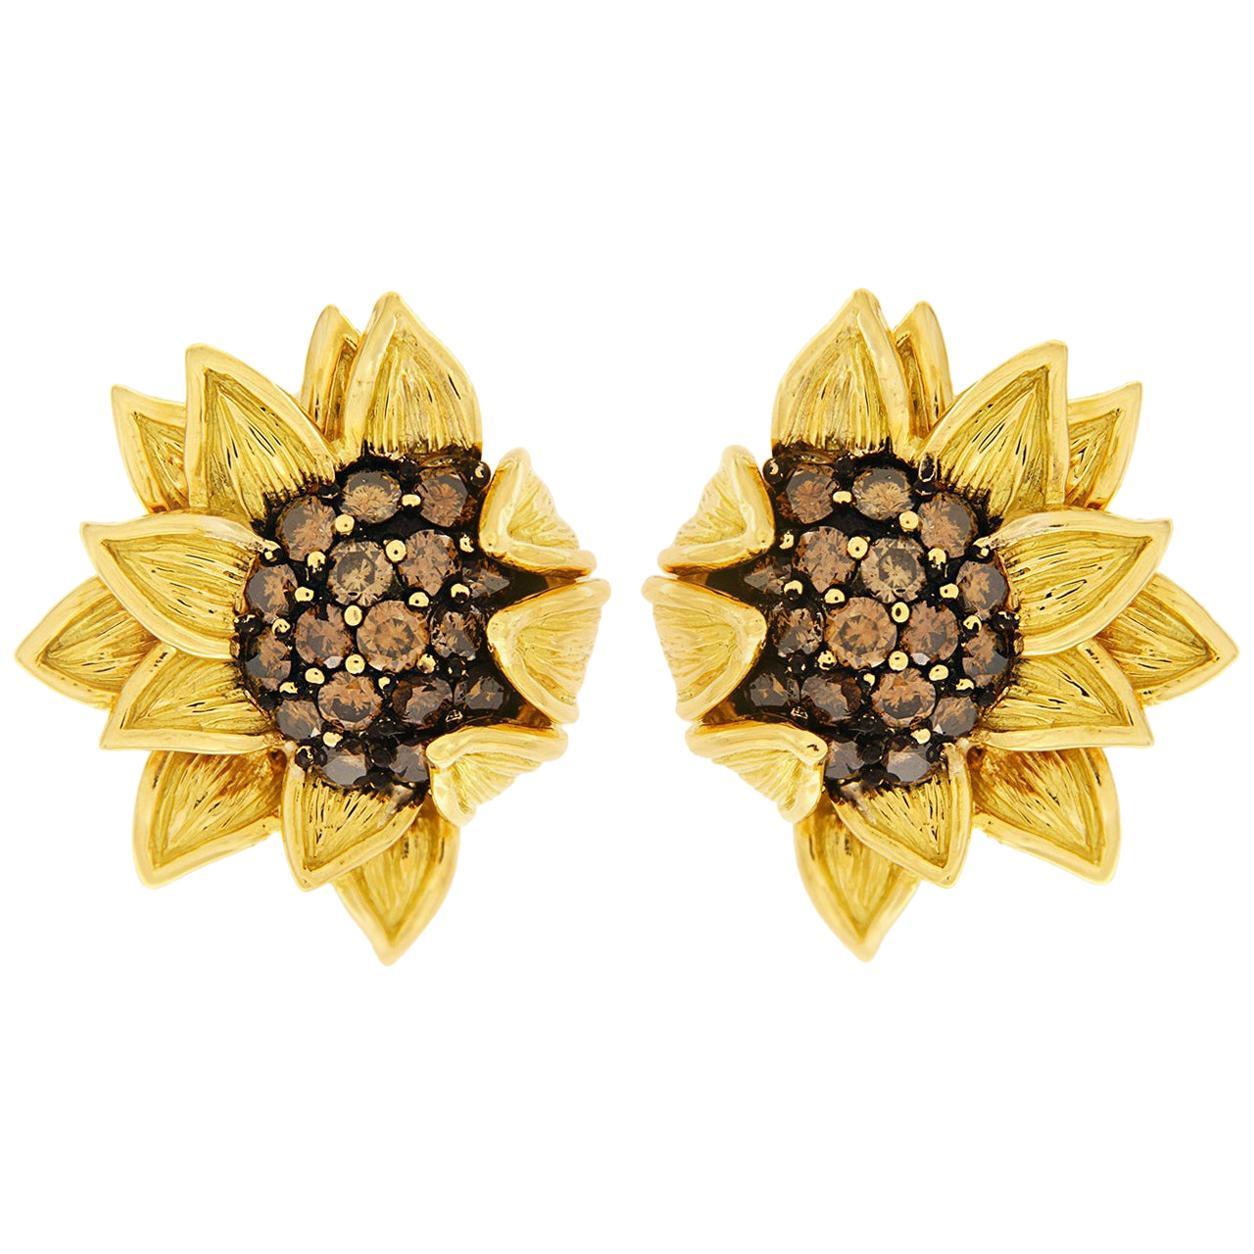 Valentin Magro Yellow Gold Cognac Diamond Sunflower Fold Over Earrings